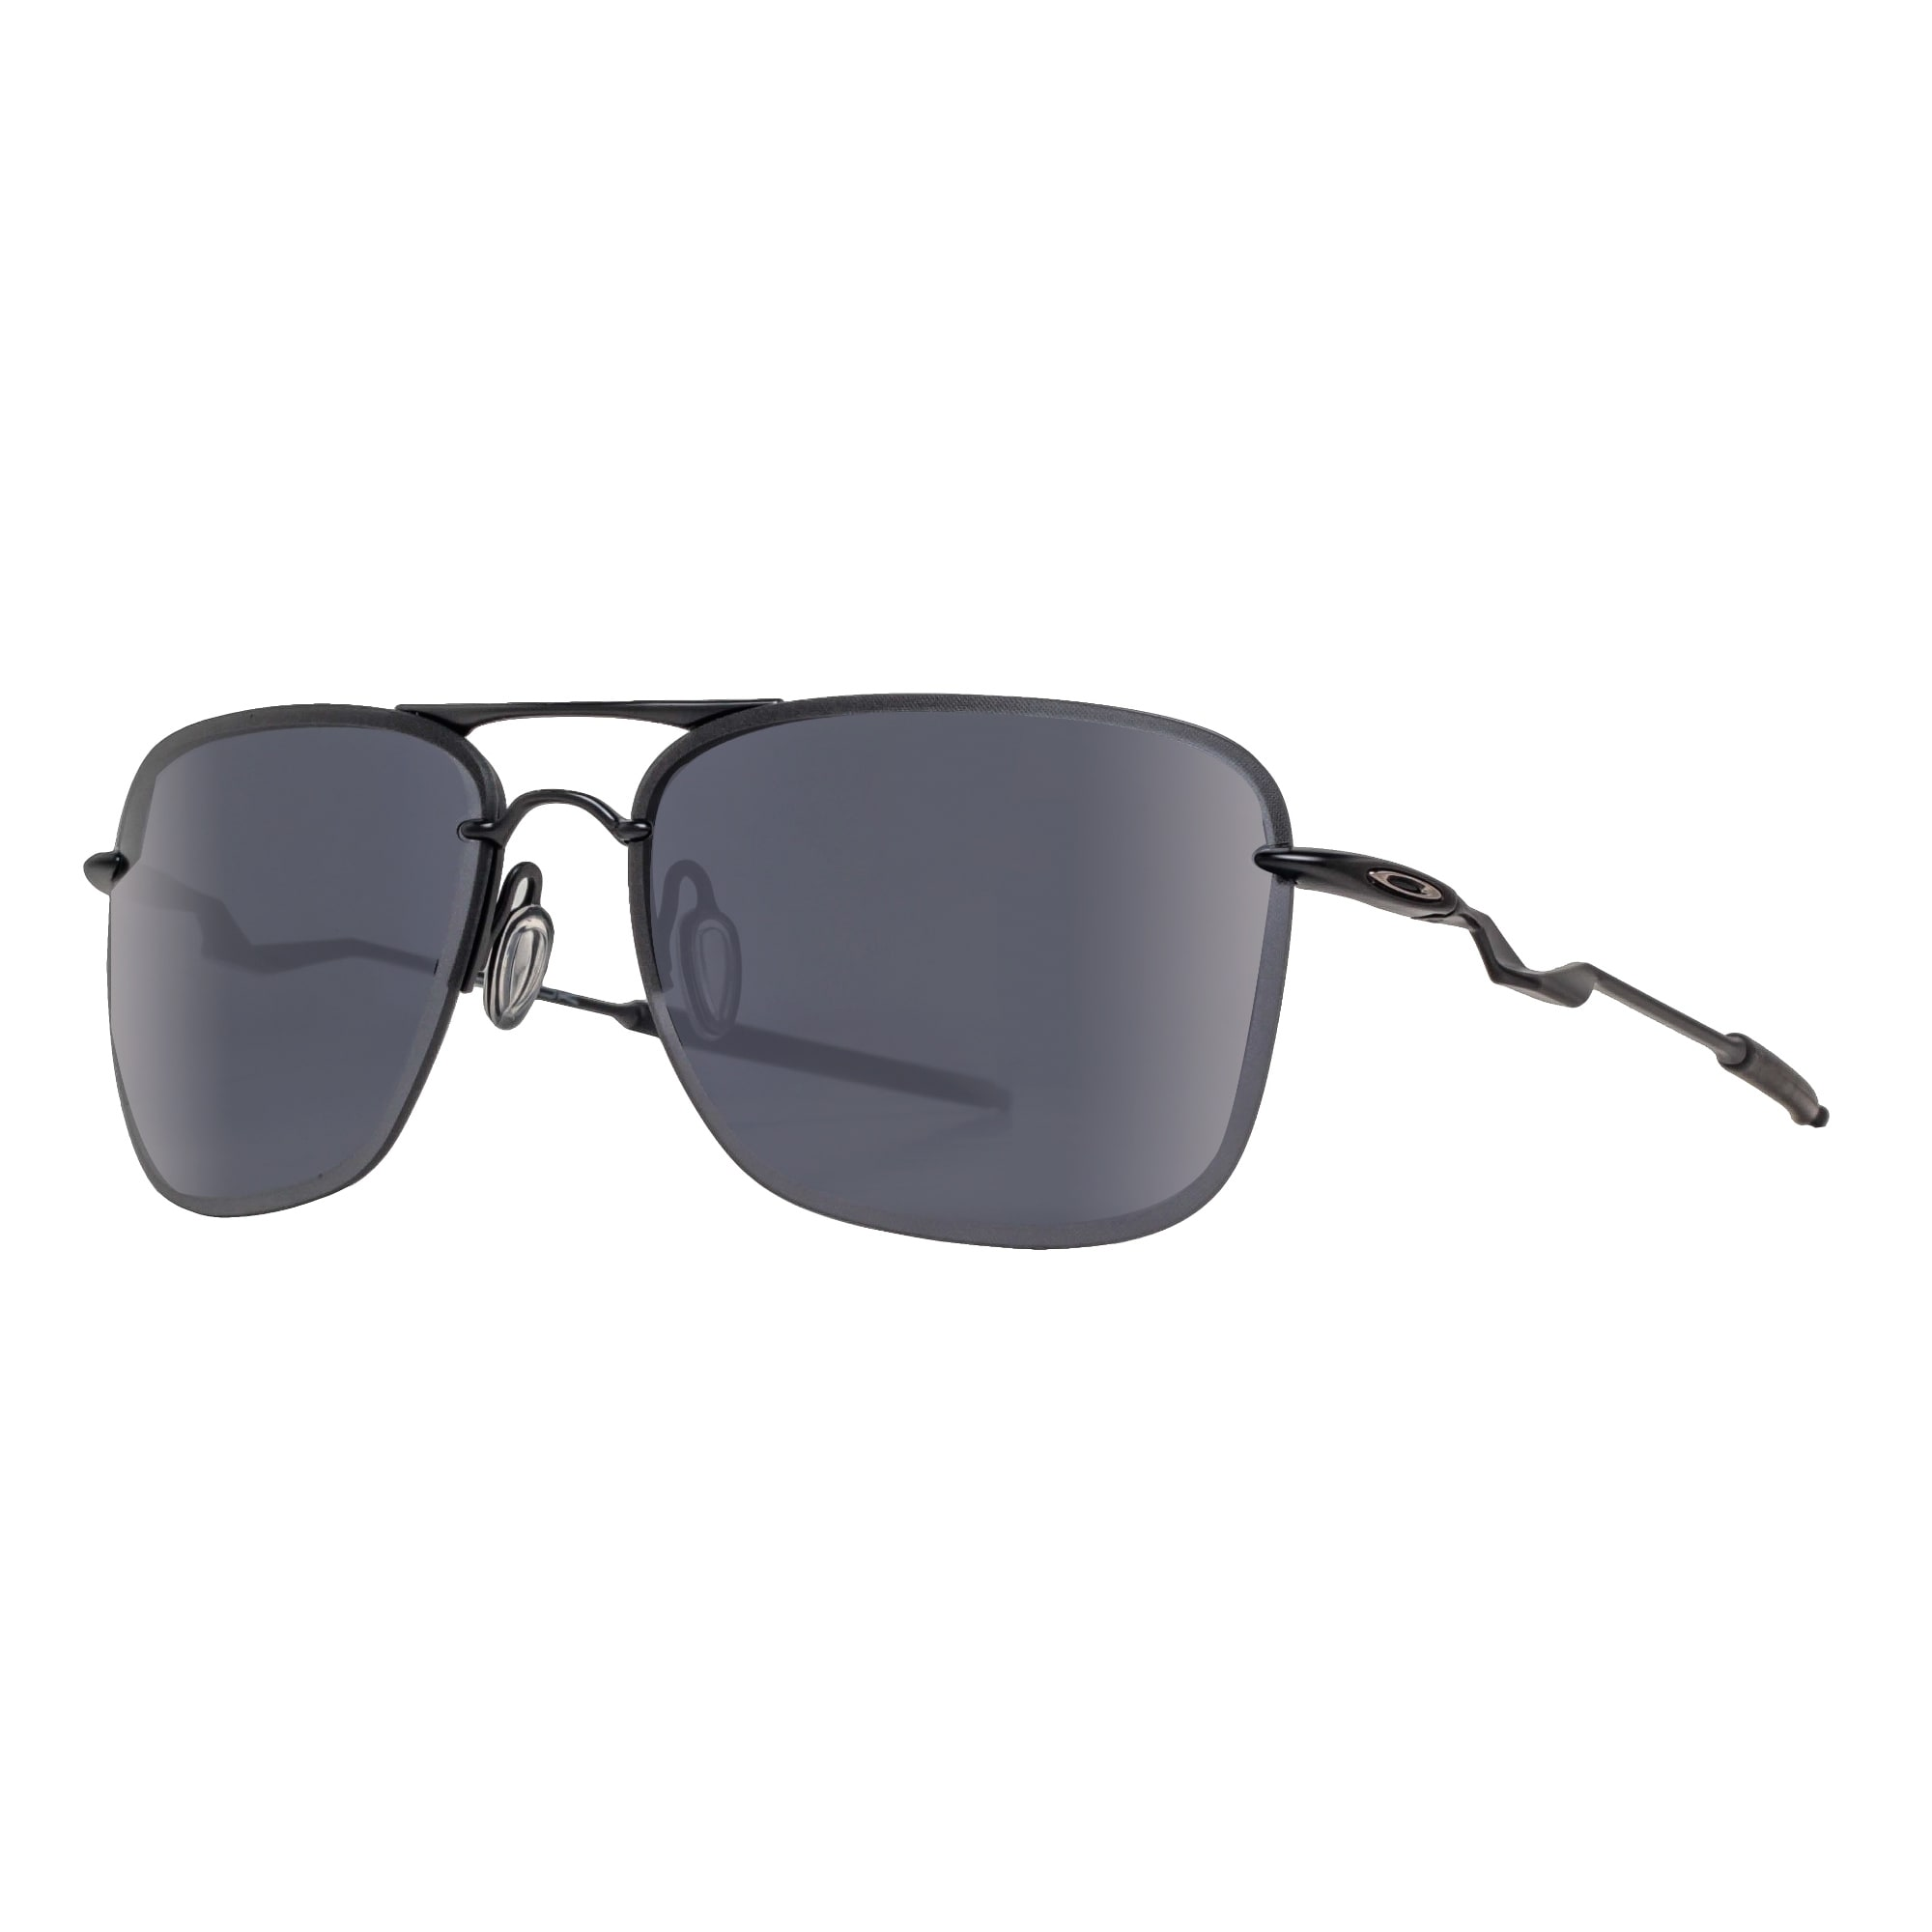 46f3a32d5a Shop Oakley Tailhook OO4087-01 60mm Satin Black Gray Men s Navigator  Sunglasses - Satin Black - 60mm-15mm-121mm - Ships To Canada - Overstock.ca  - 18222557